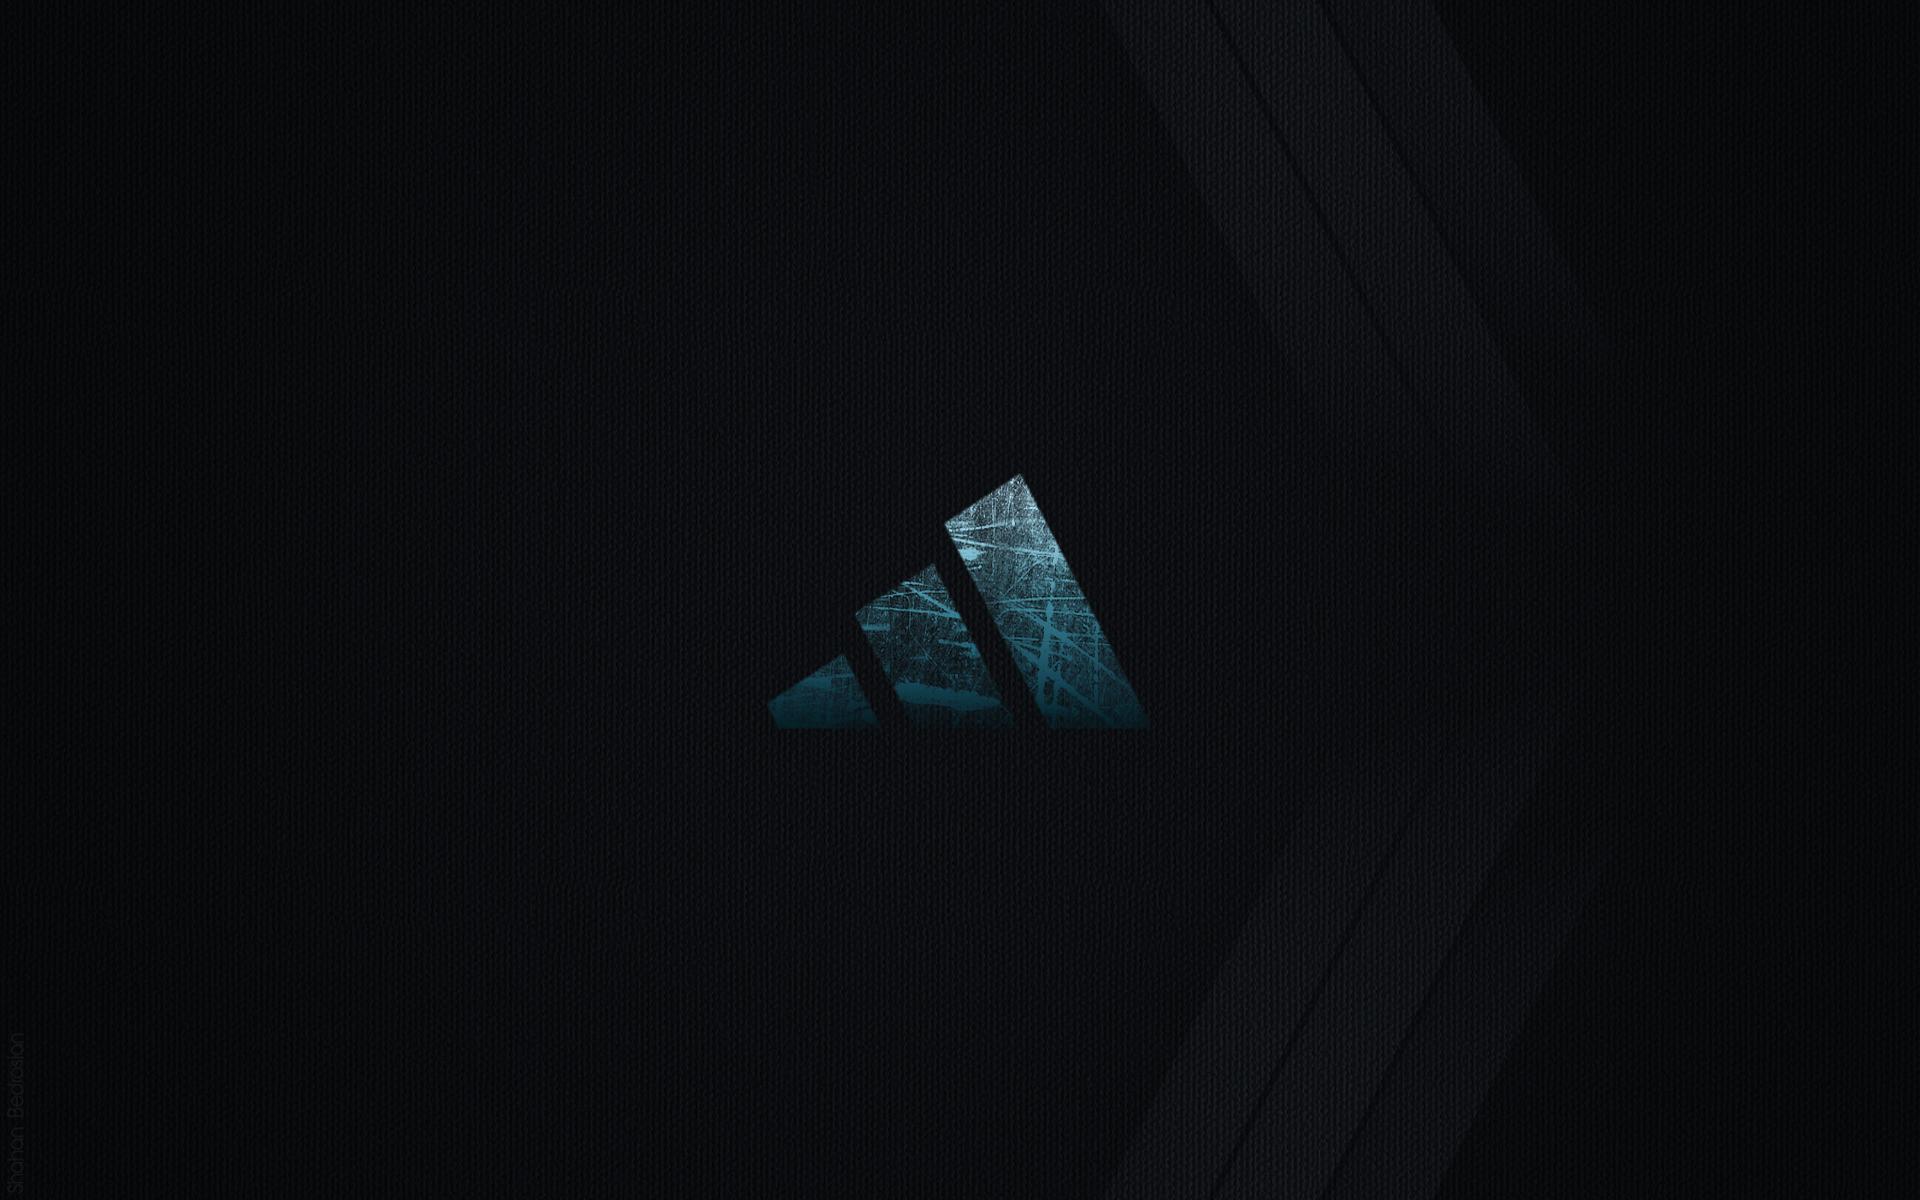 Adidas Logo Wallpaper Desktop Images Pictures   Becuo 1920x1200